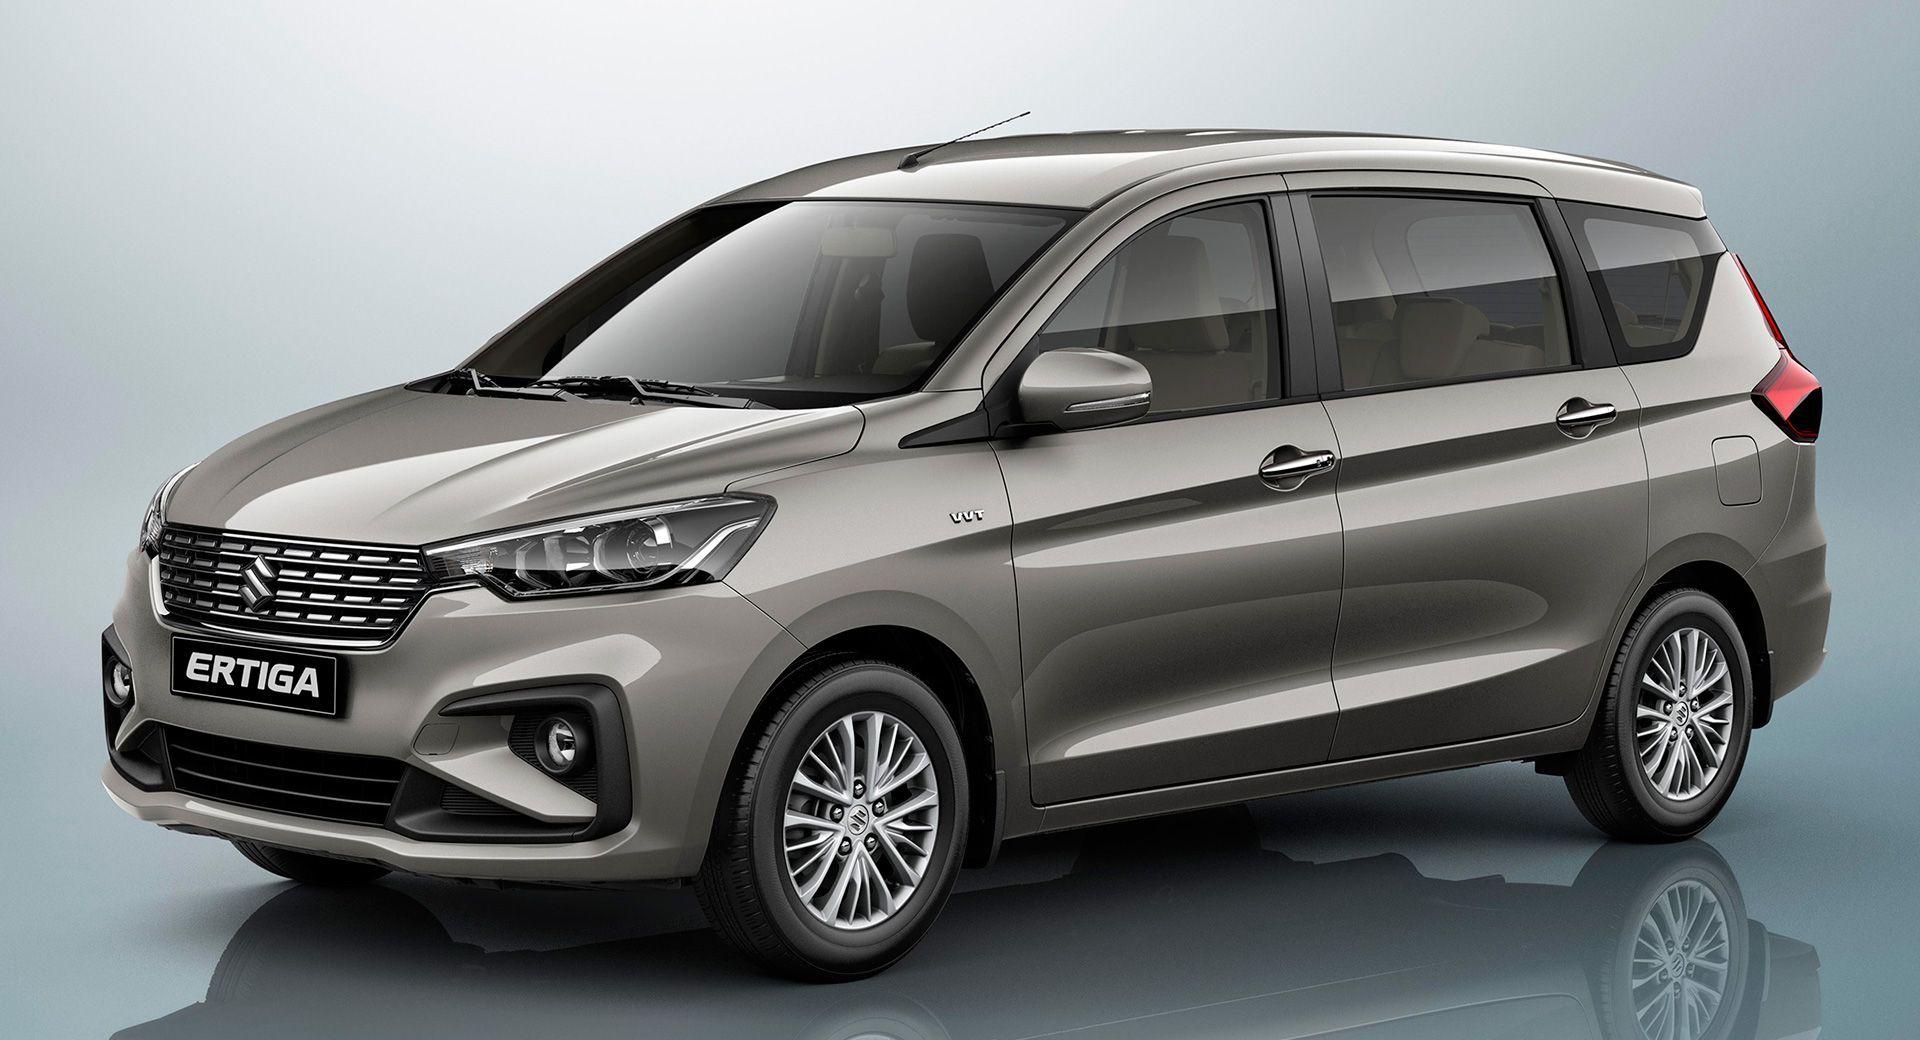 Suzuki Reveals An All New Ertiga Minivan At Indonesia Auto Show